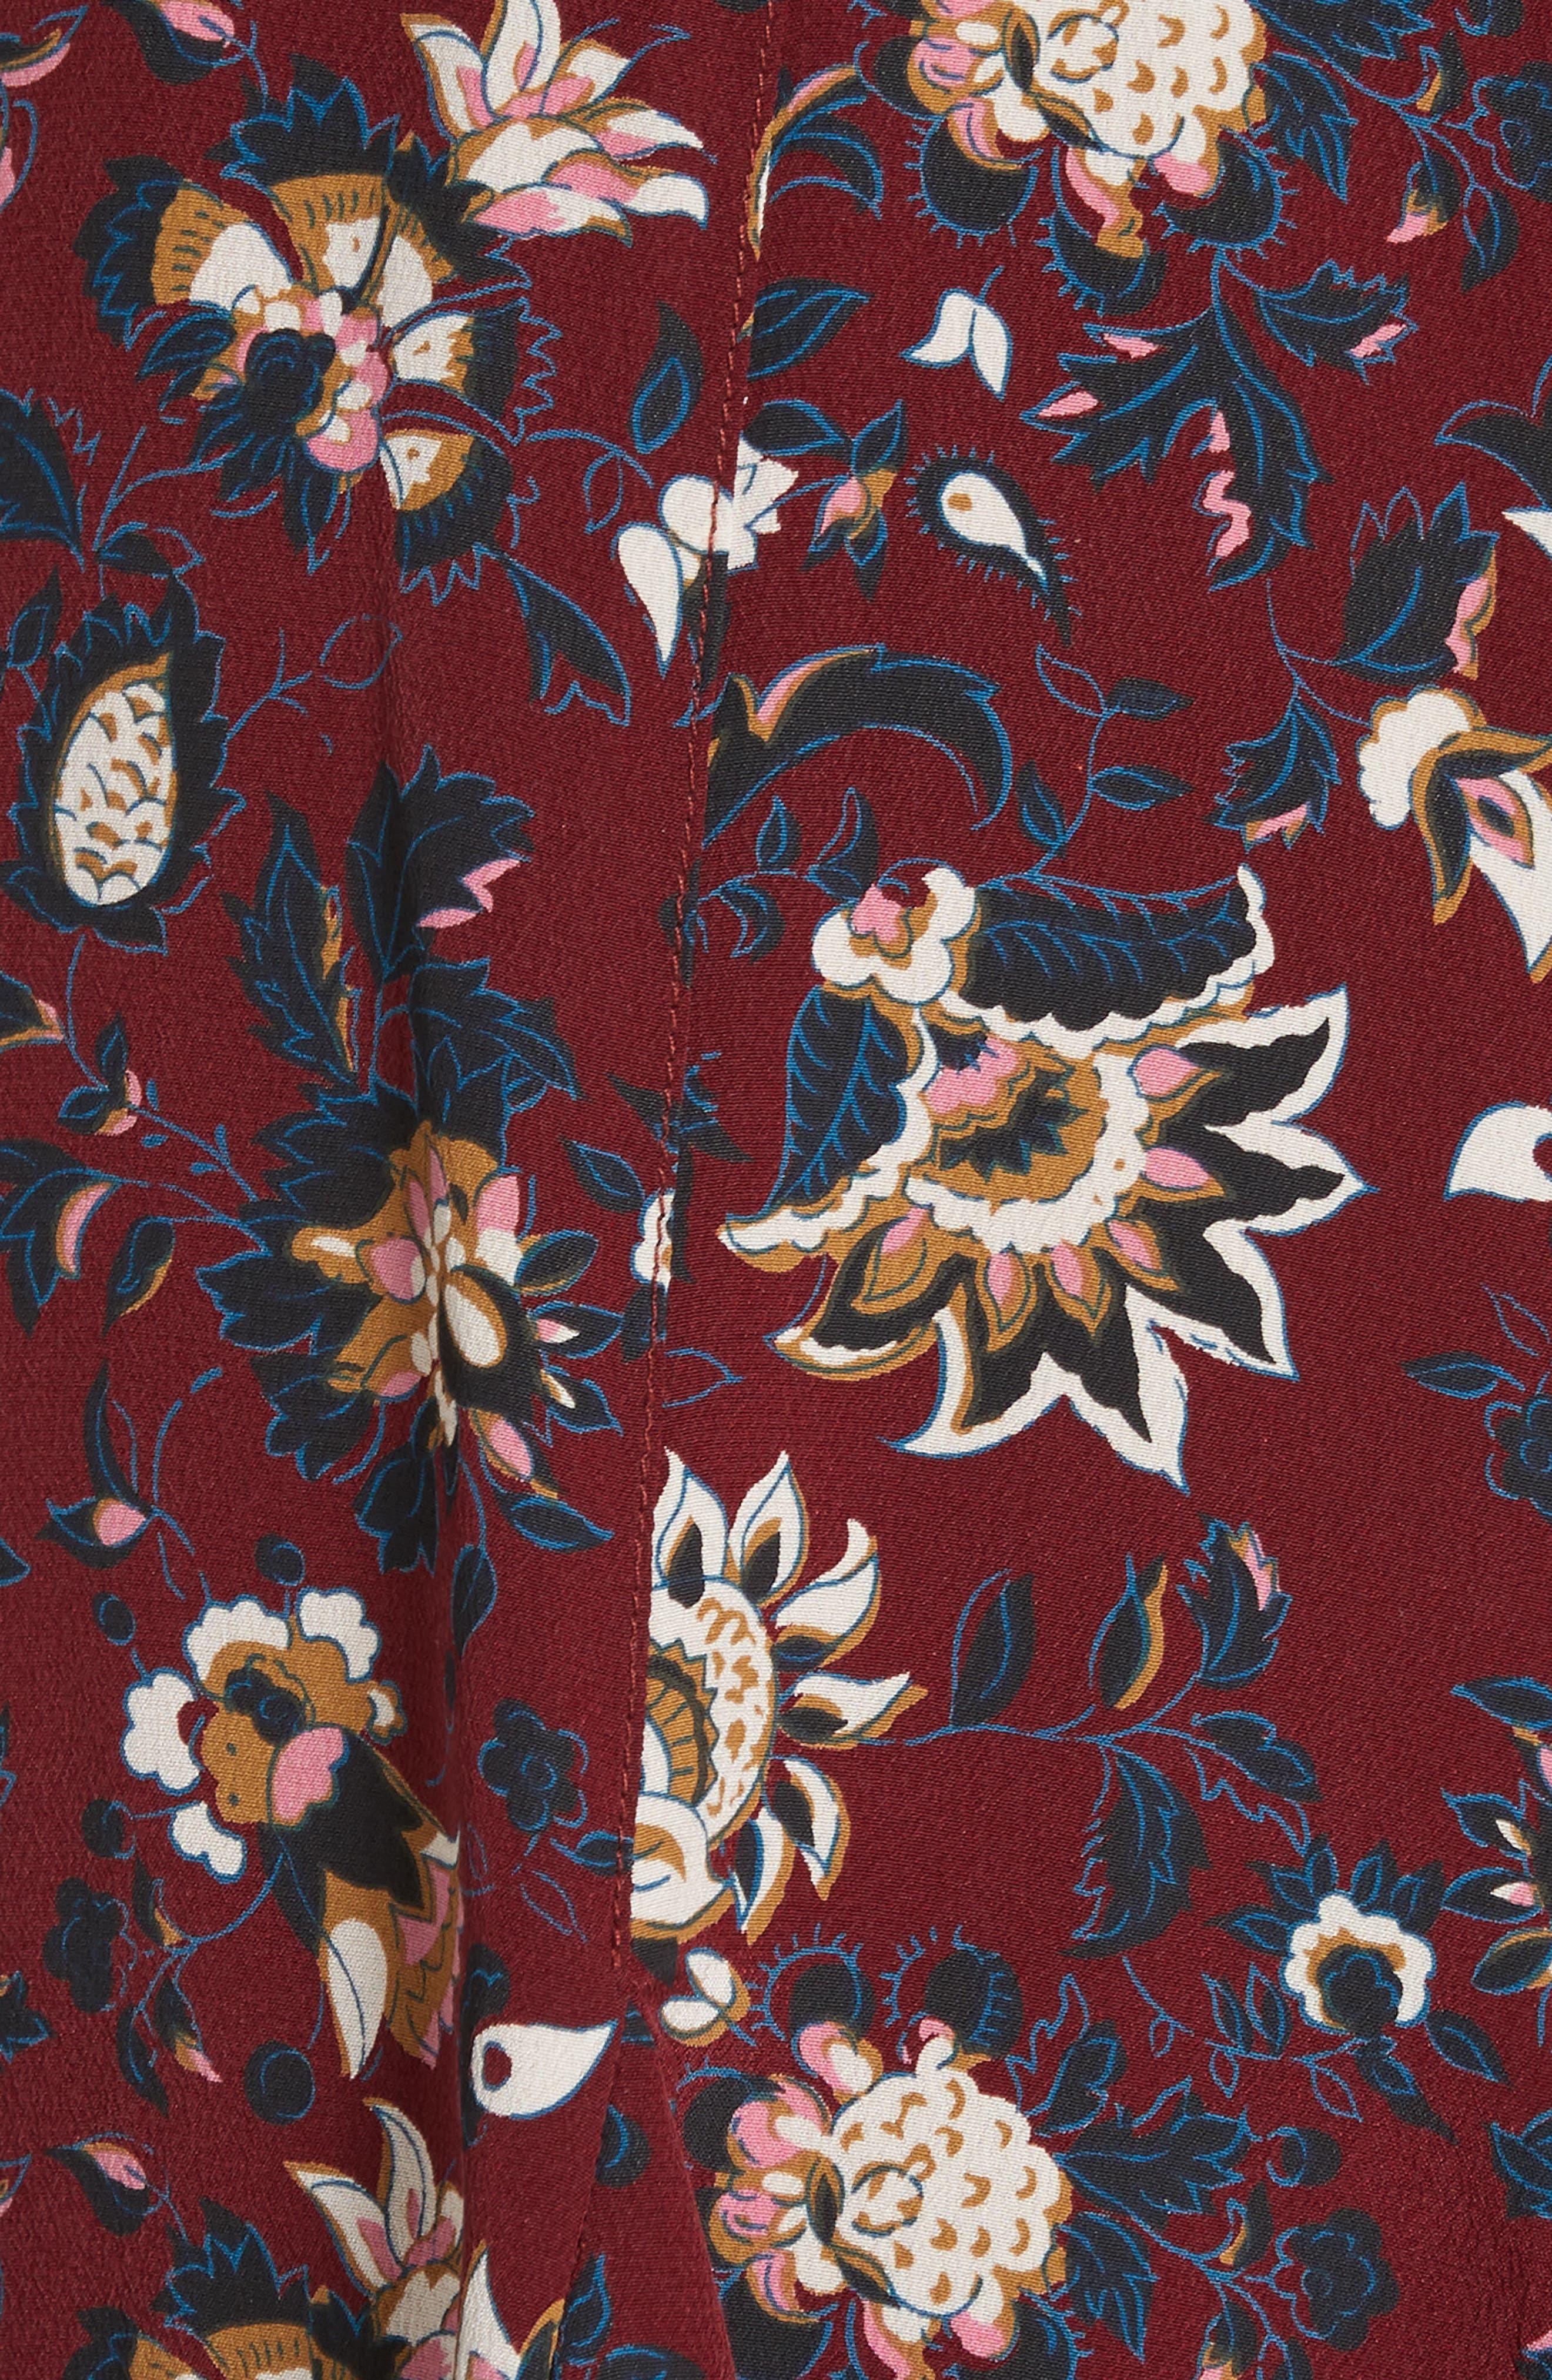 Riggins Silk Dress,                             Alternate thumbnail 6, color,                             BORDEAUX MULTI